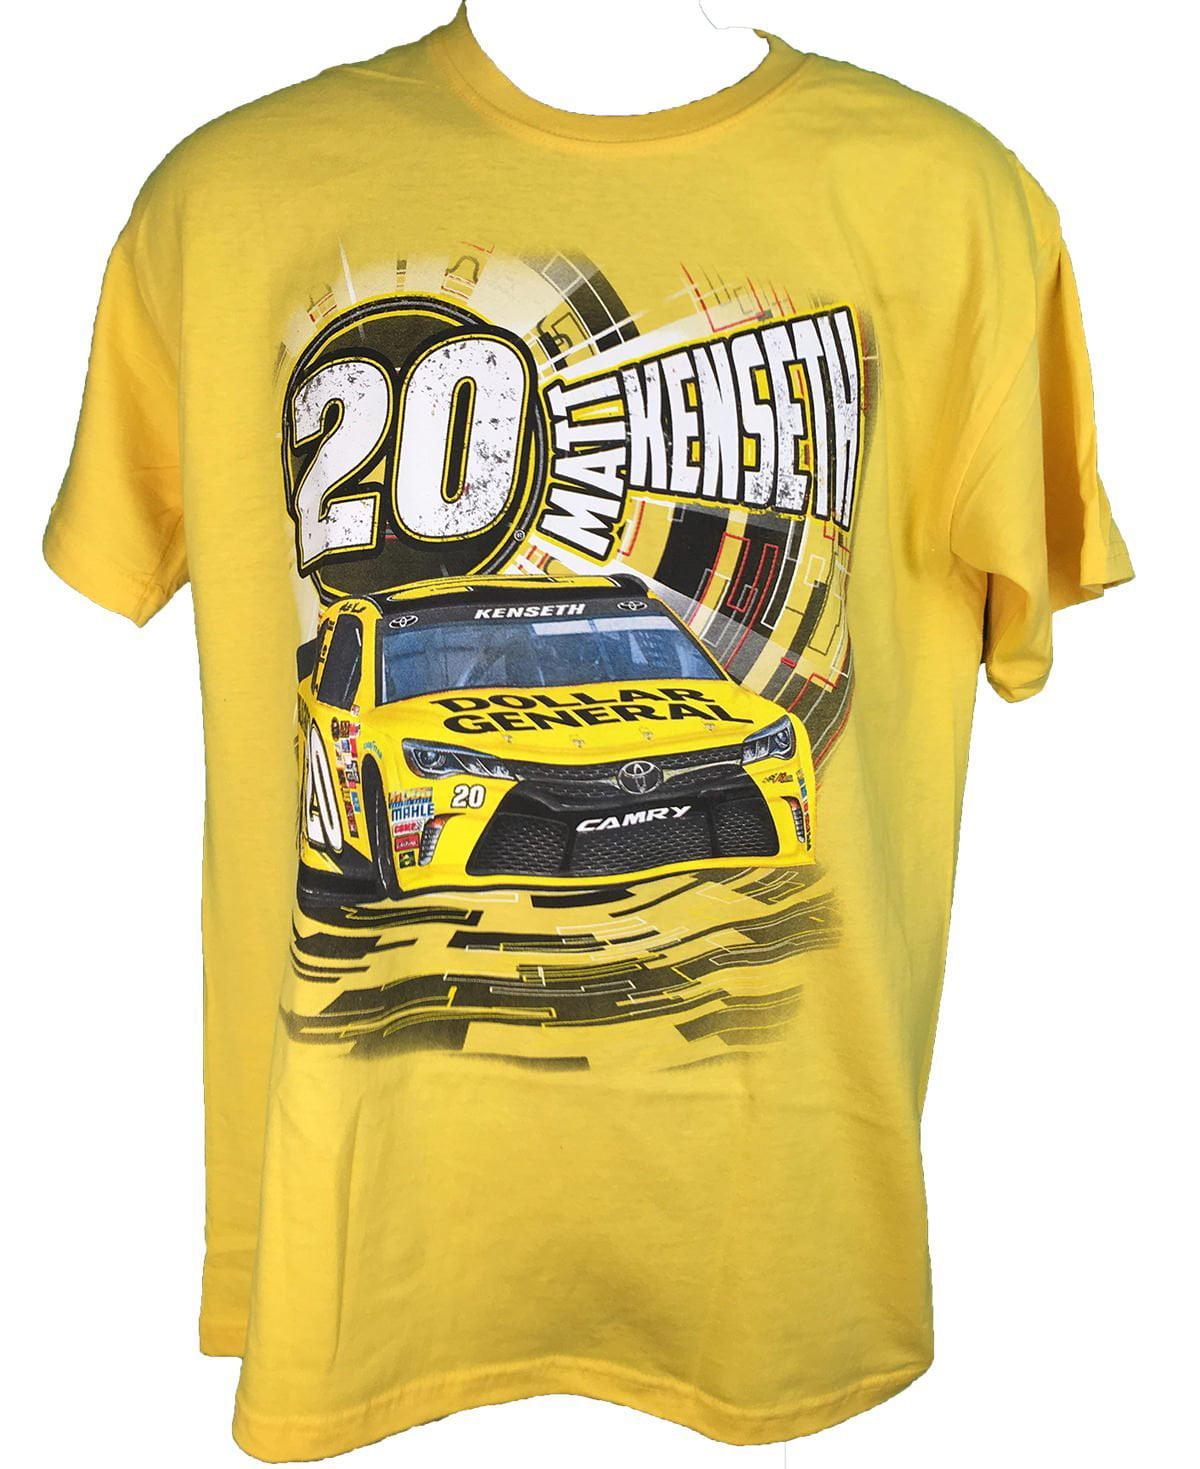 2016 Nascar Matt Kenseth Dollar General #20 Speedbolt Adult T-Shirt (3X) by Checkered Flag